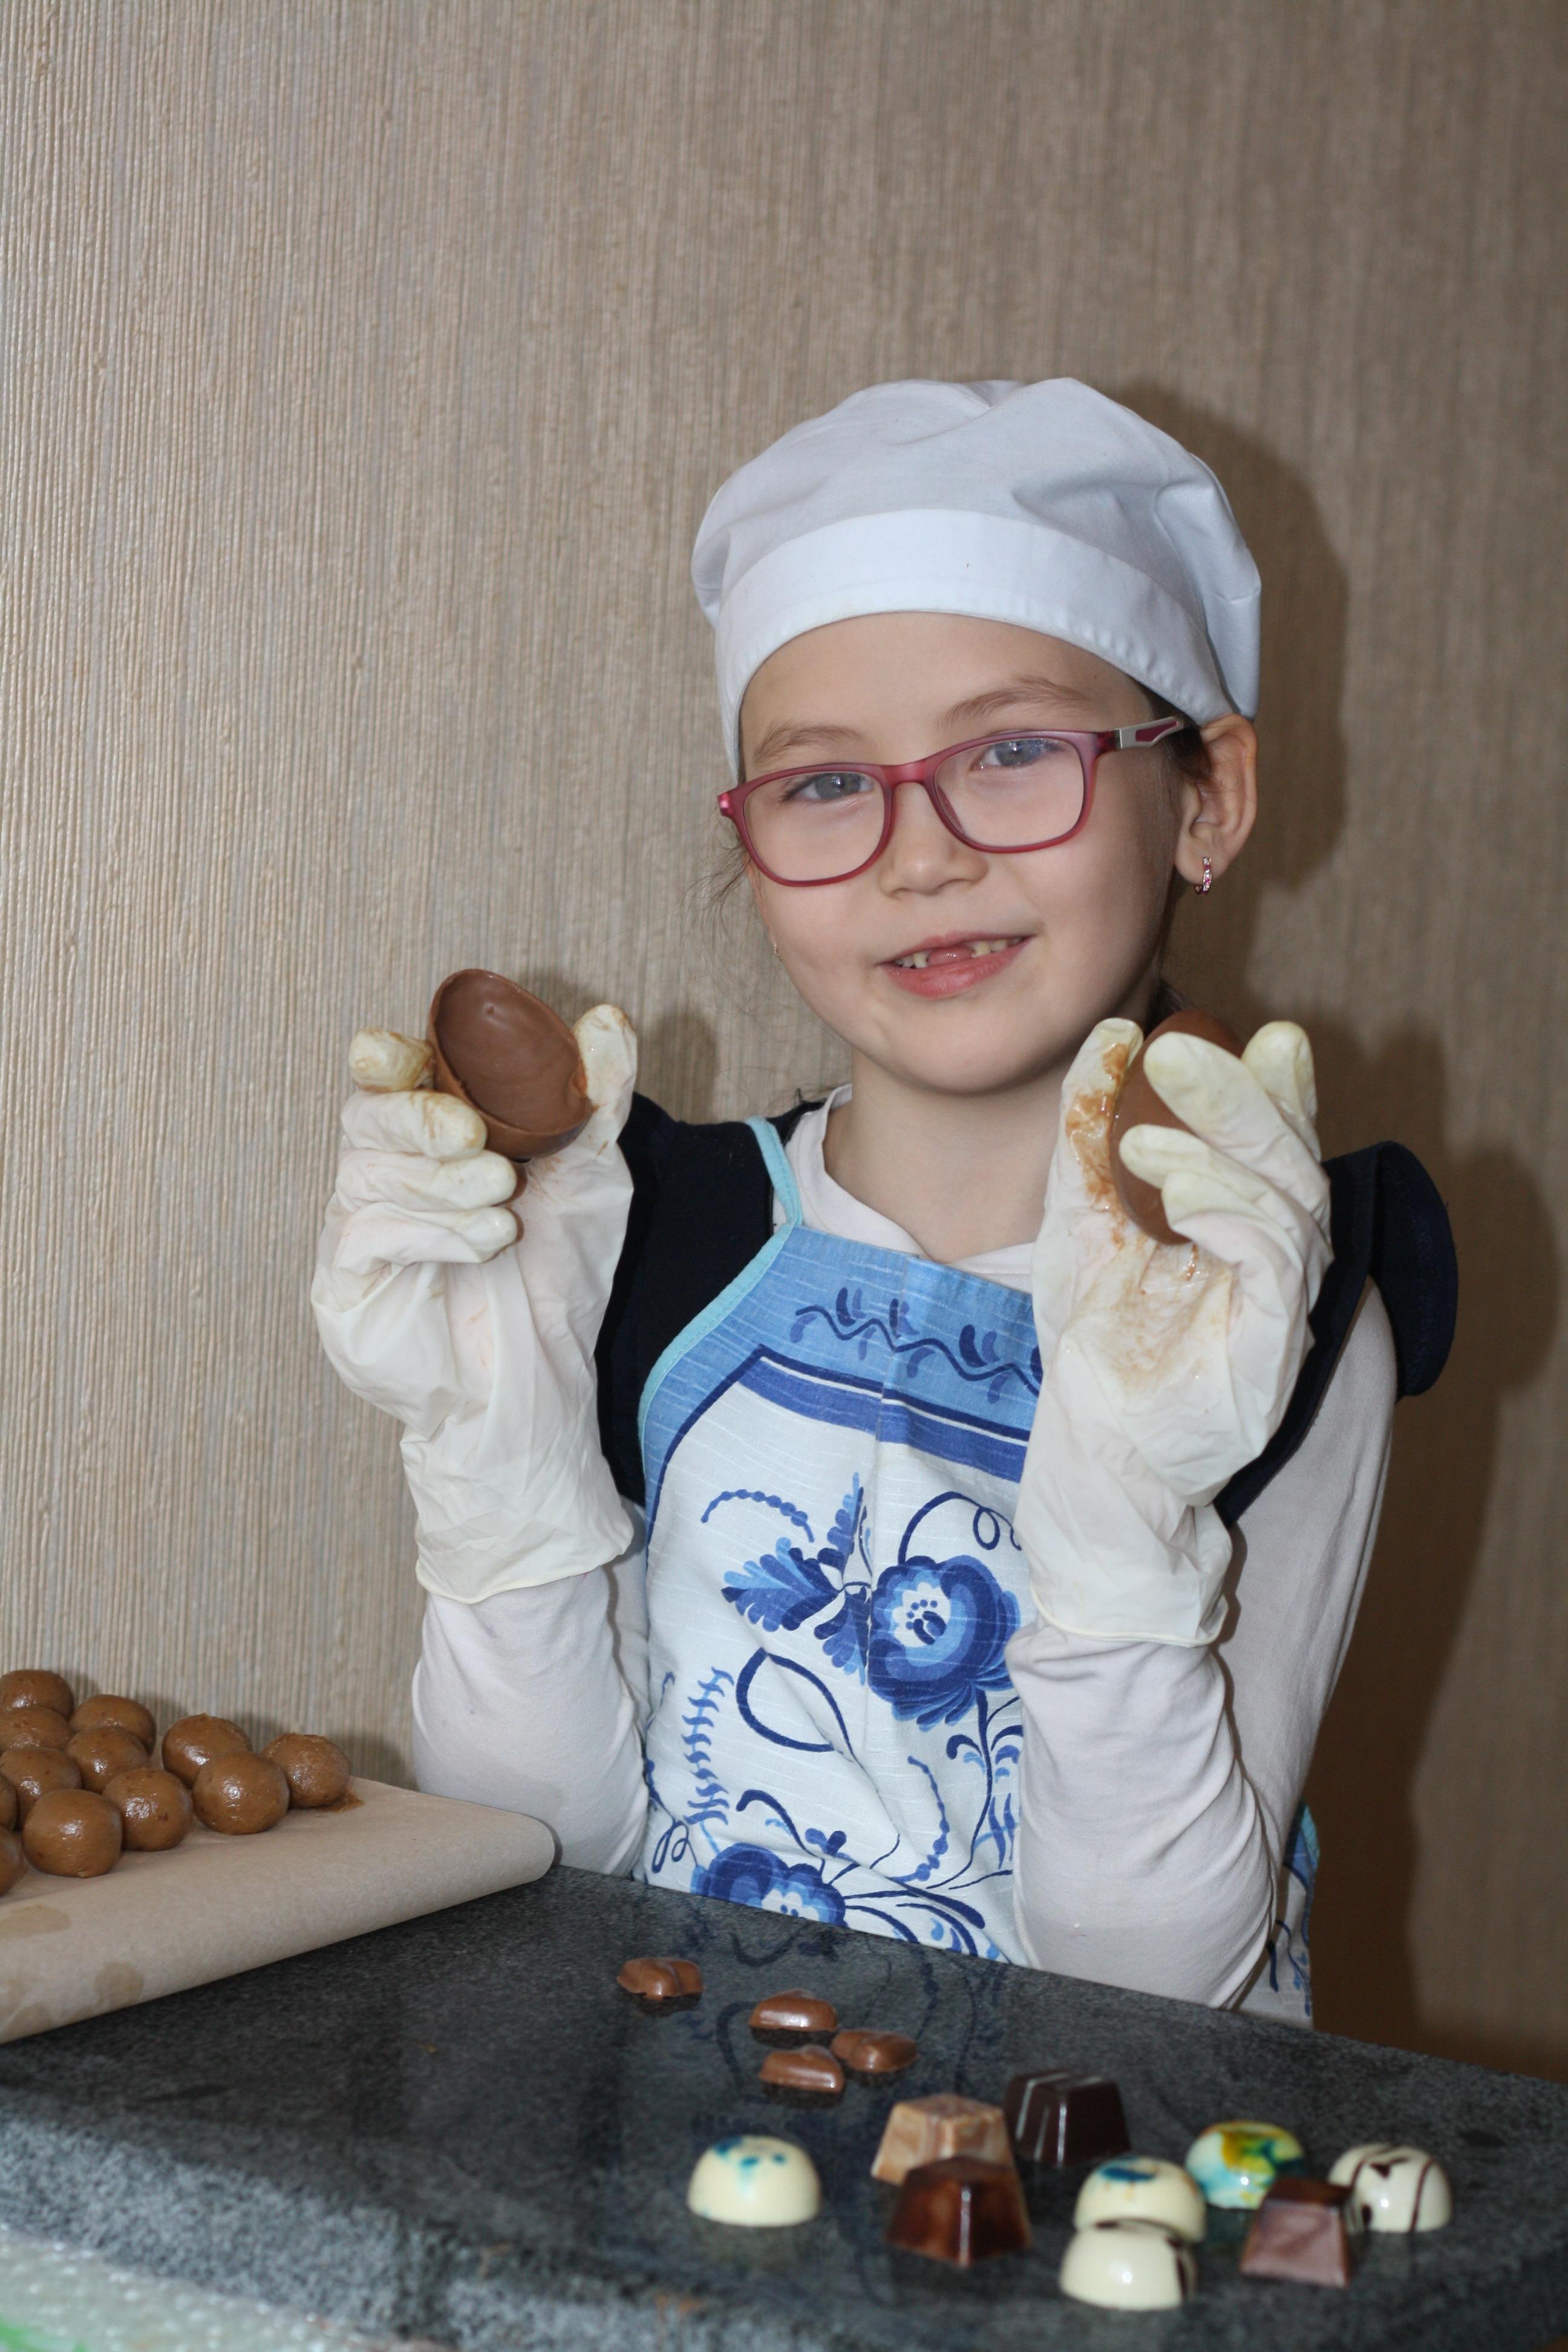 Миладка лепит шоколадки. Настоящая хозяйка